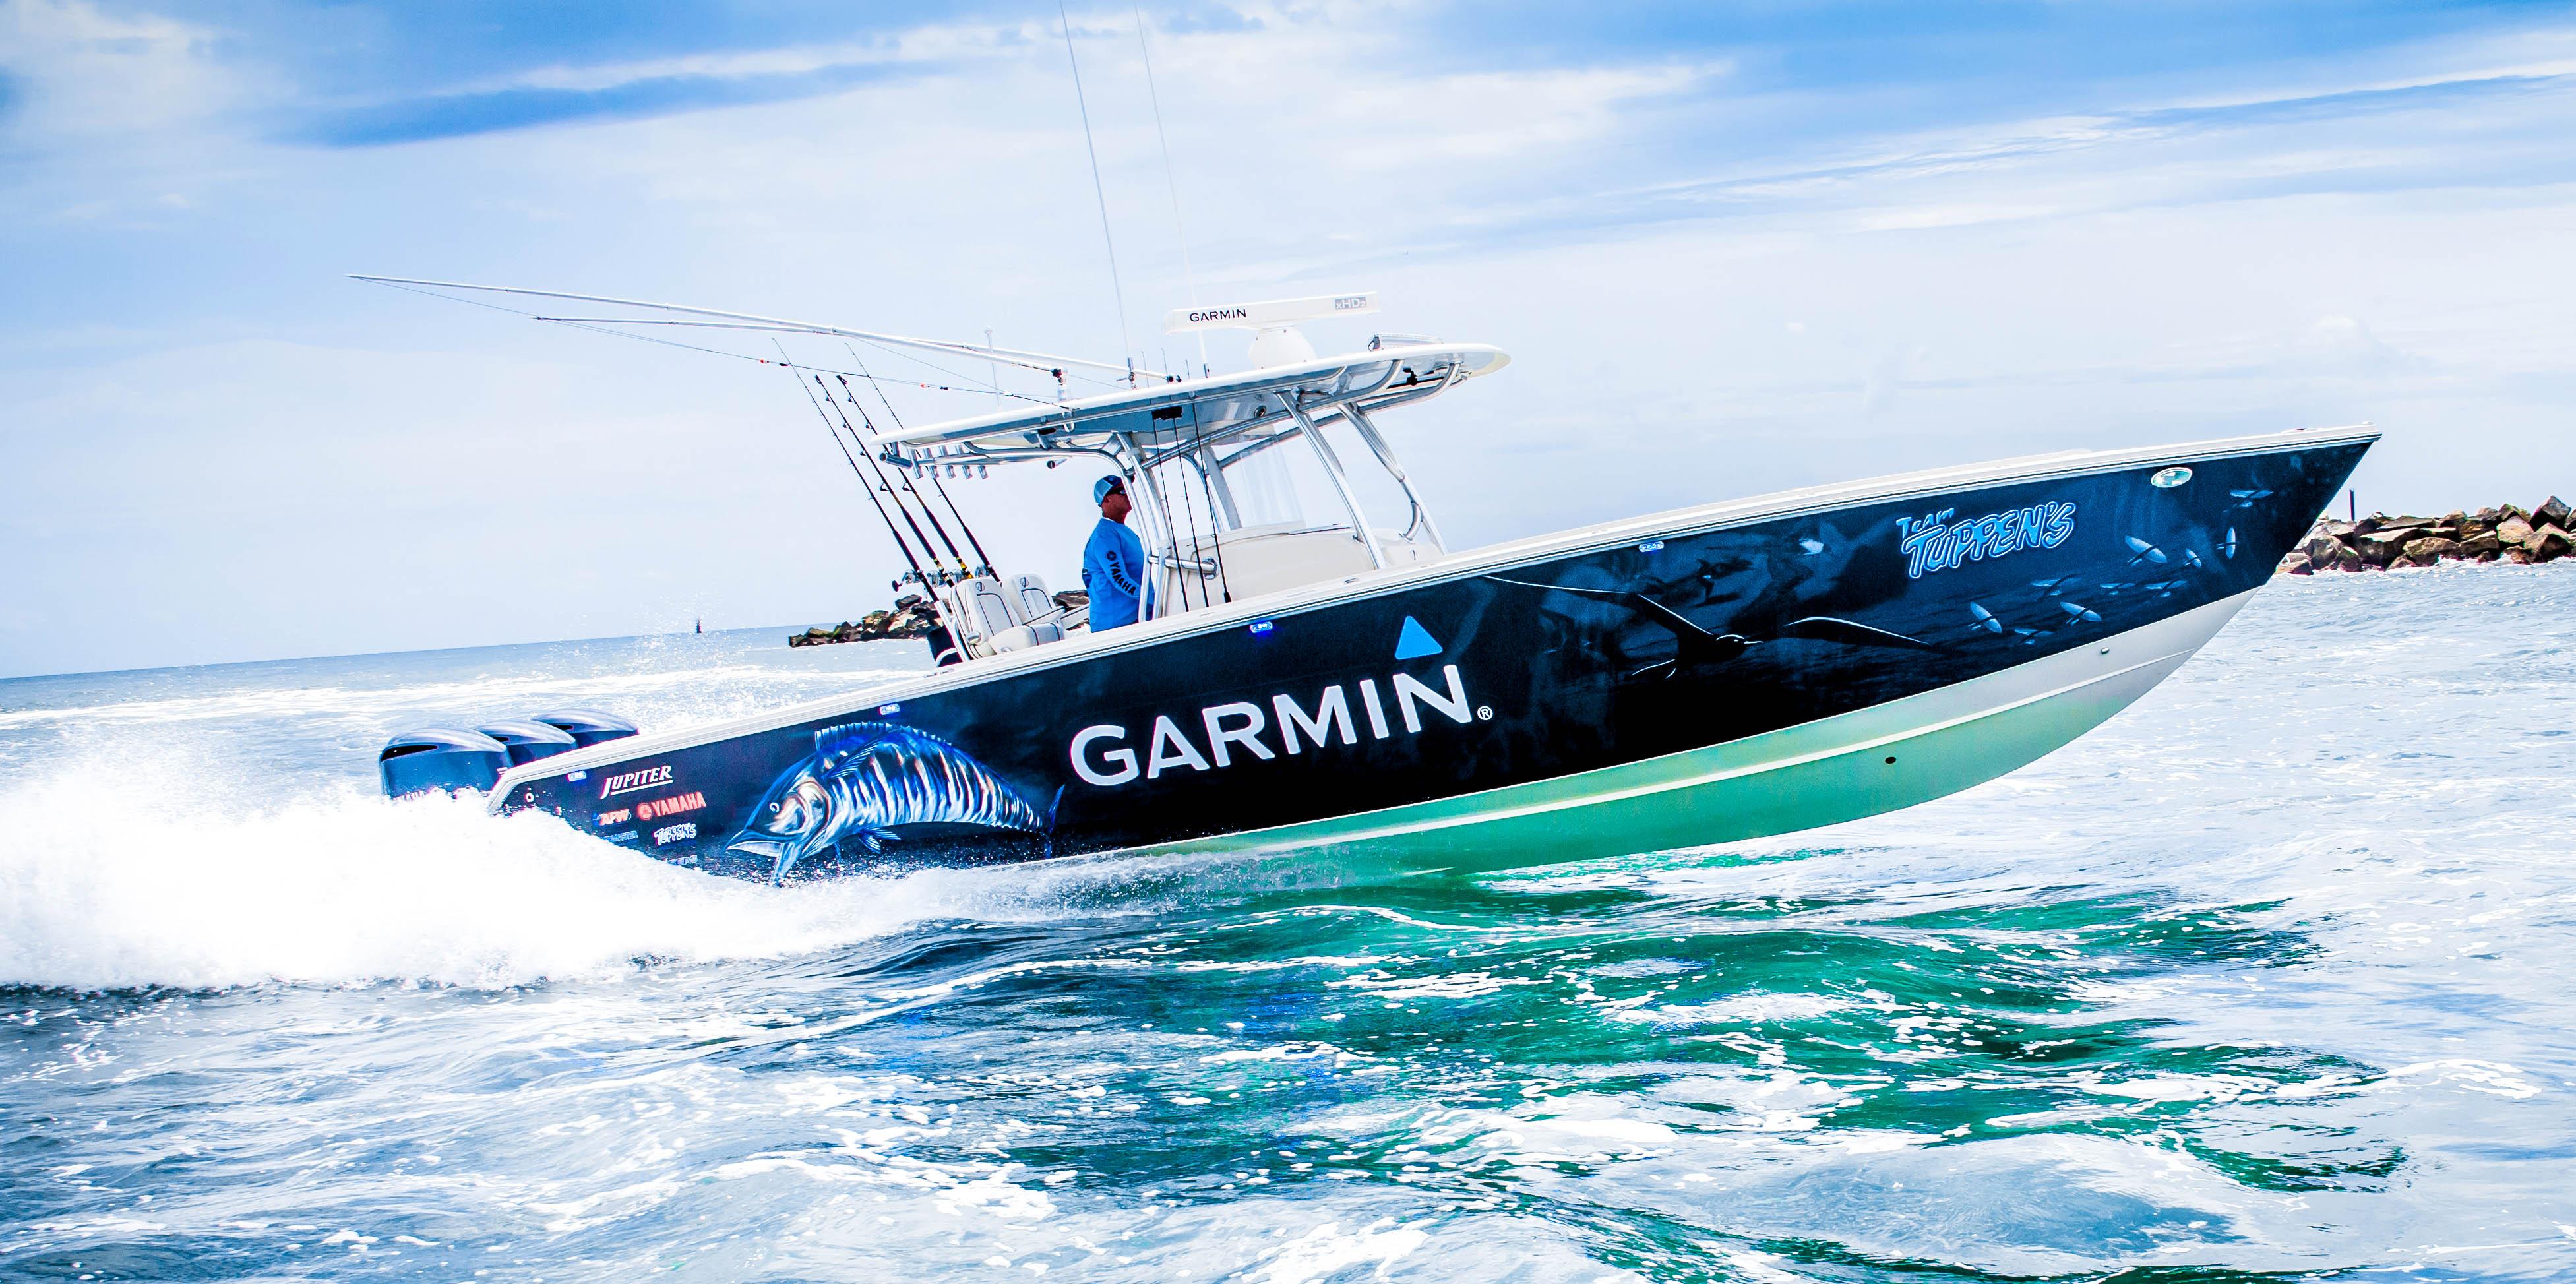 Garmin Acquires Navionics To Increase Product Depth